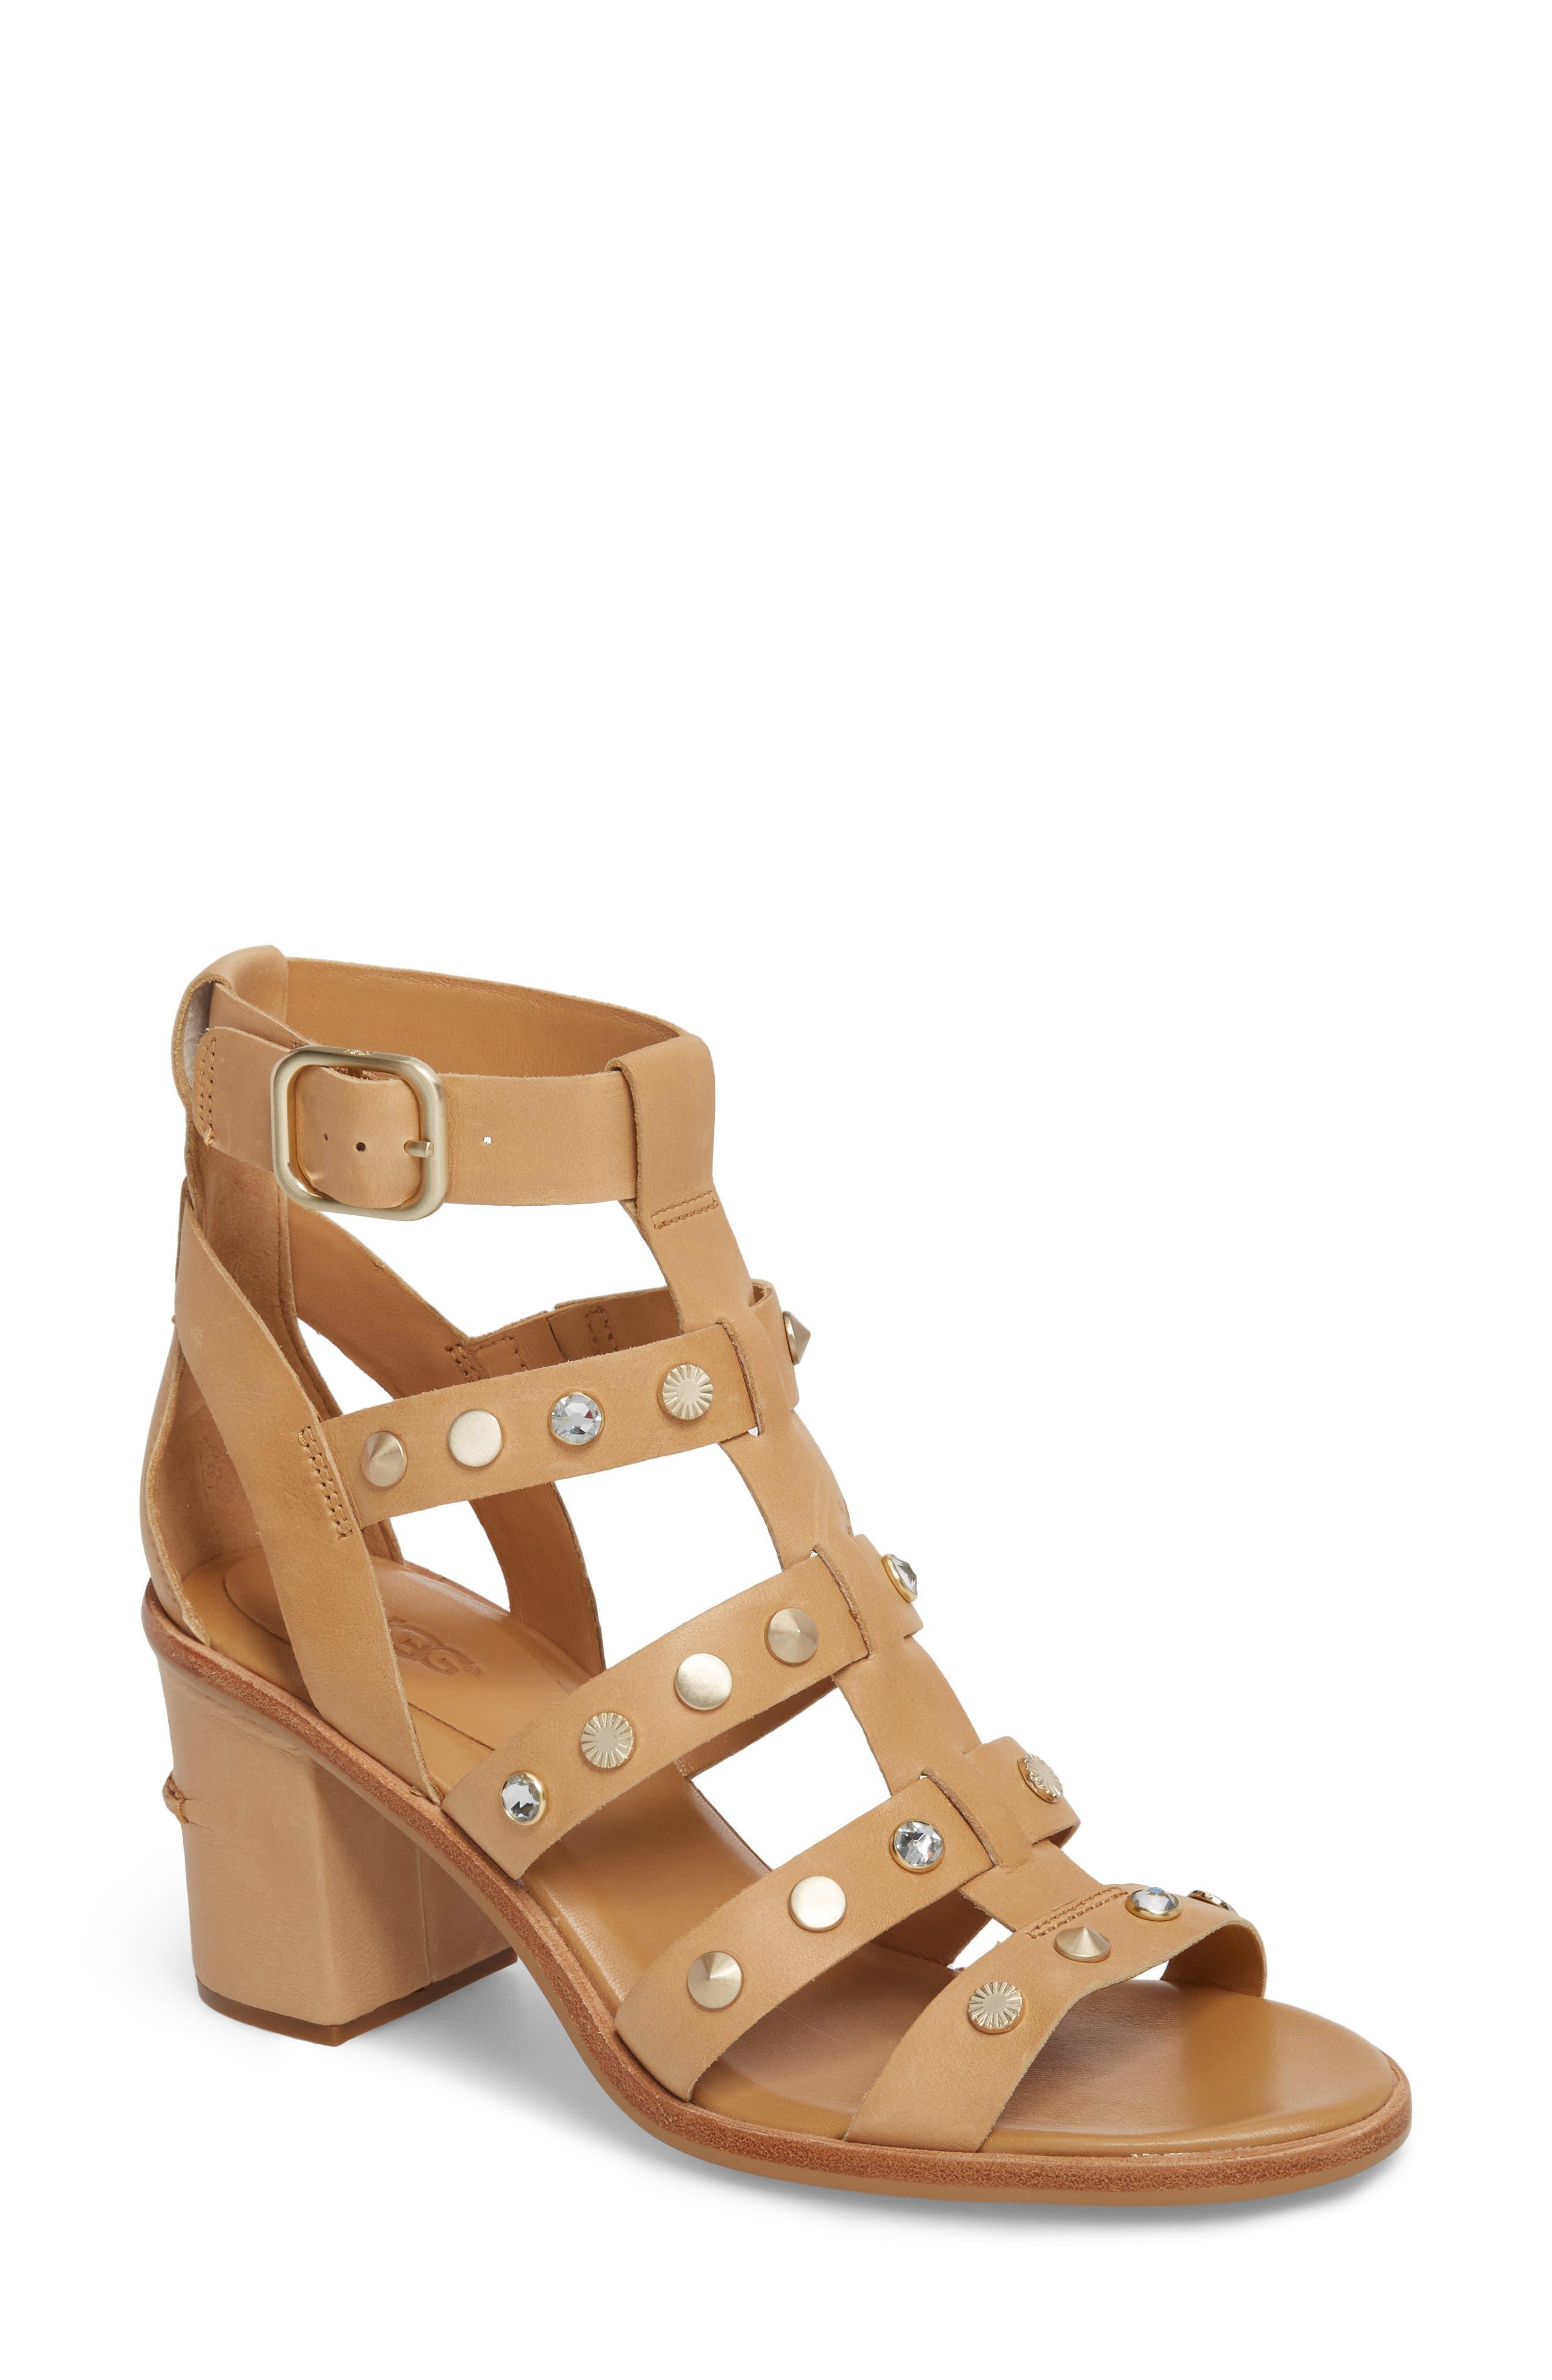 Macayla Studded Sandal,                             Main thumbnail 1, color,                             Latte Suede